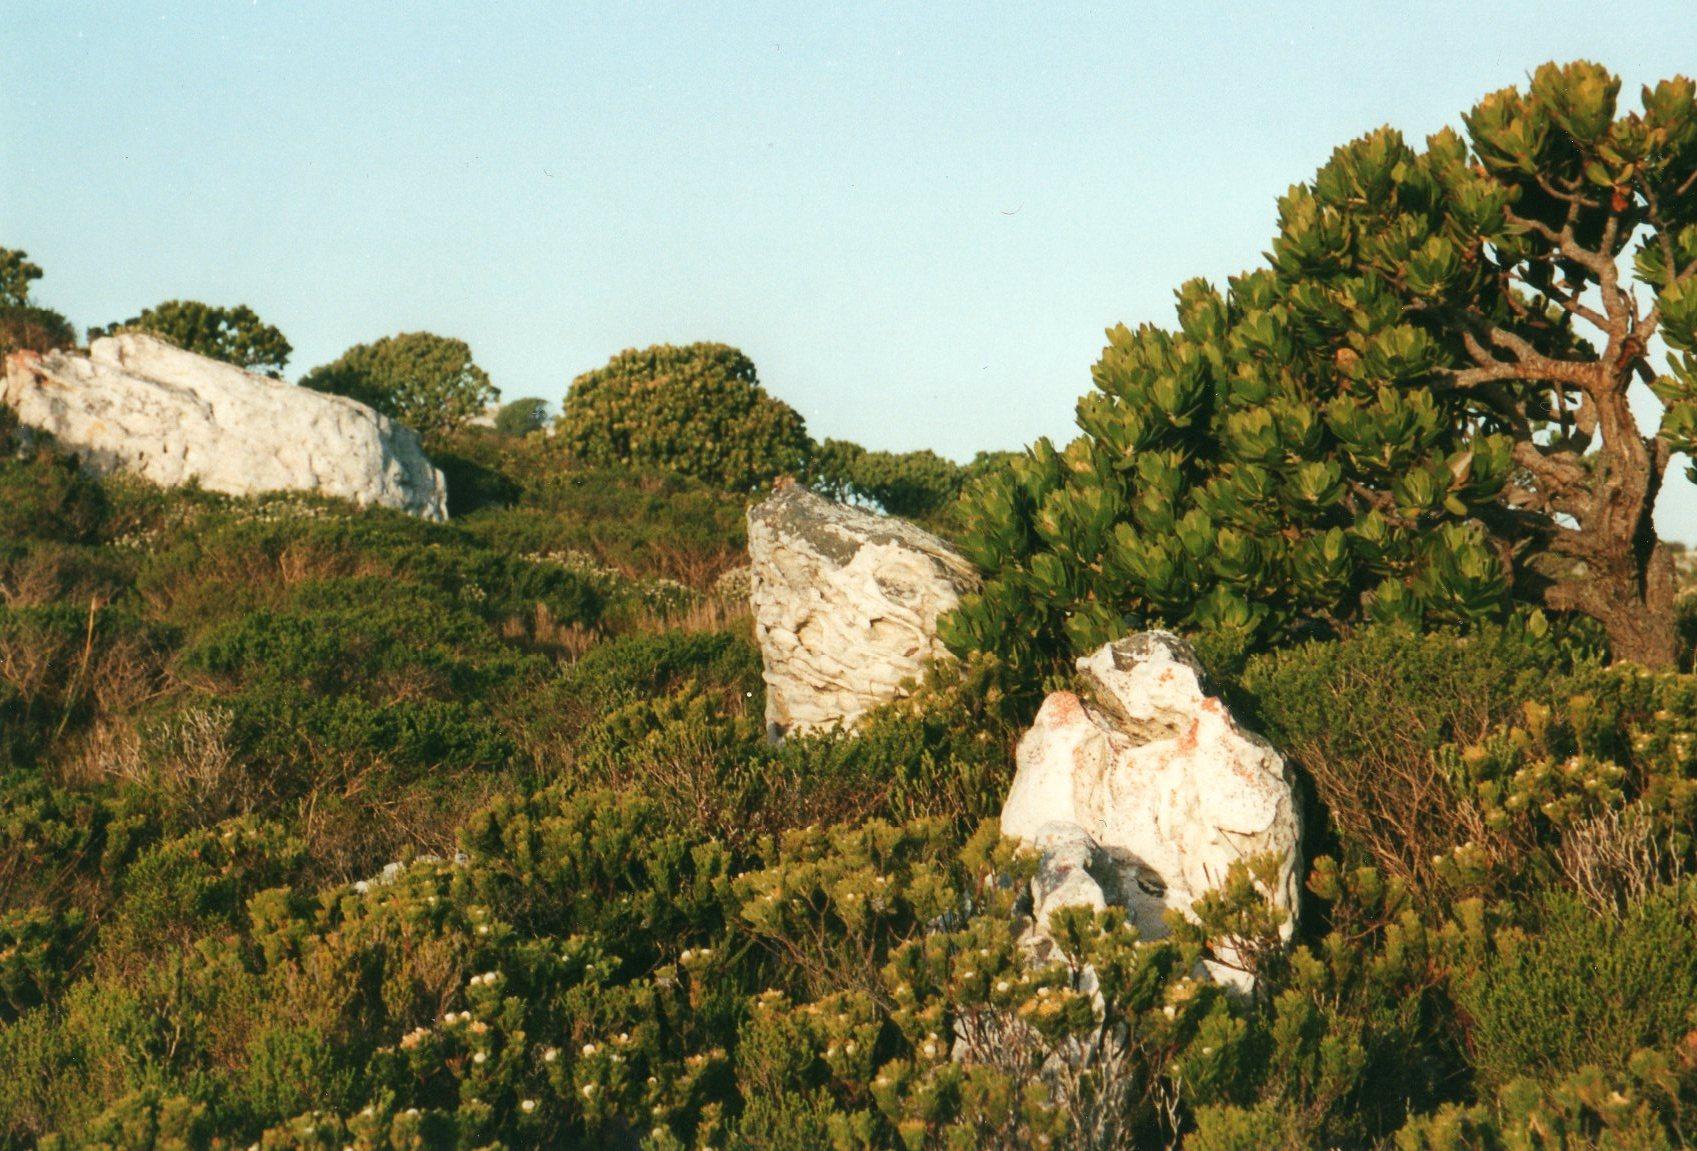 South Africa Western Cape Cape Area, Cape of Good Hope, Cape of Good Hope - glorious fynbos, Walkopedia